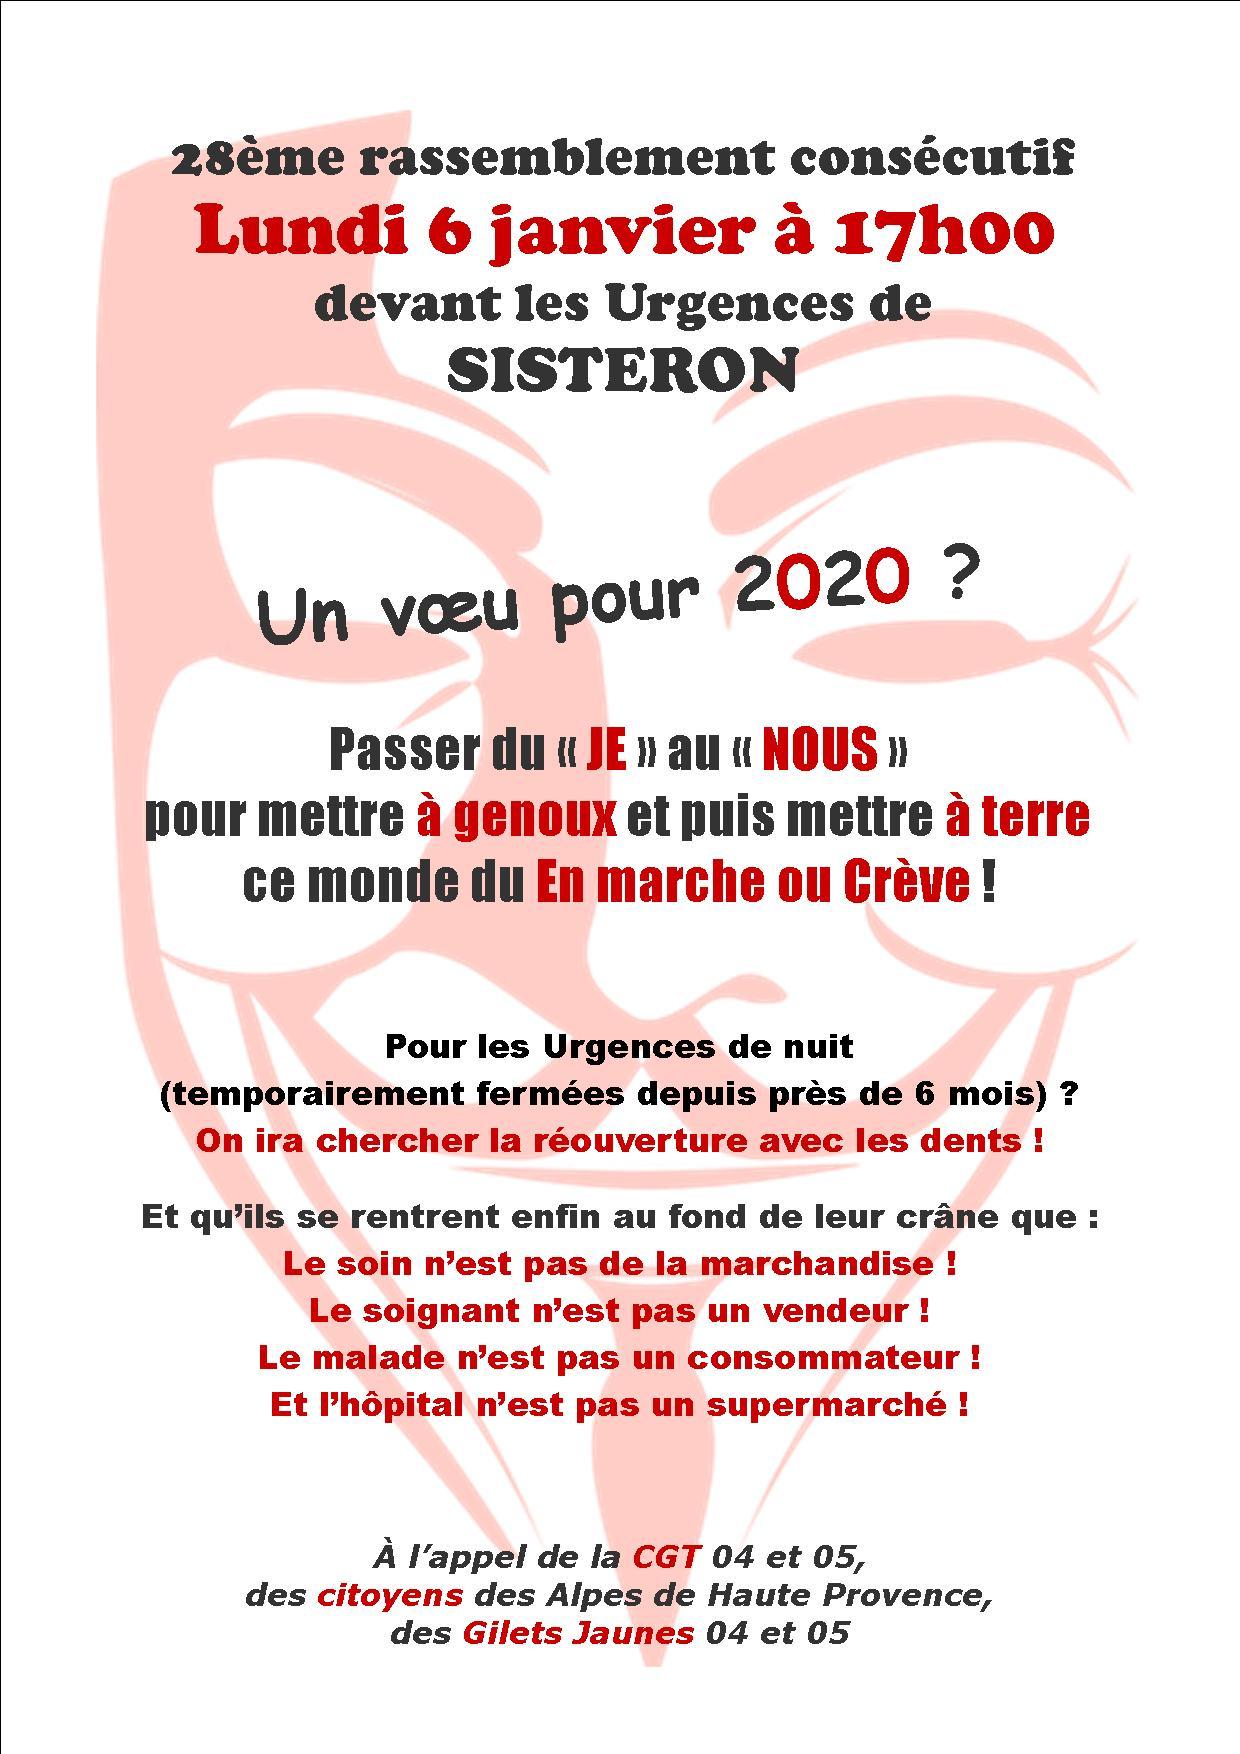 Tract Urgences de Sisteron 6 janvier 2020